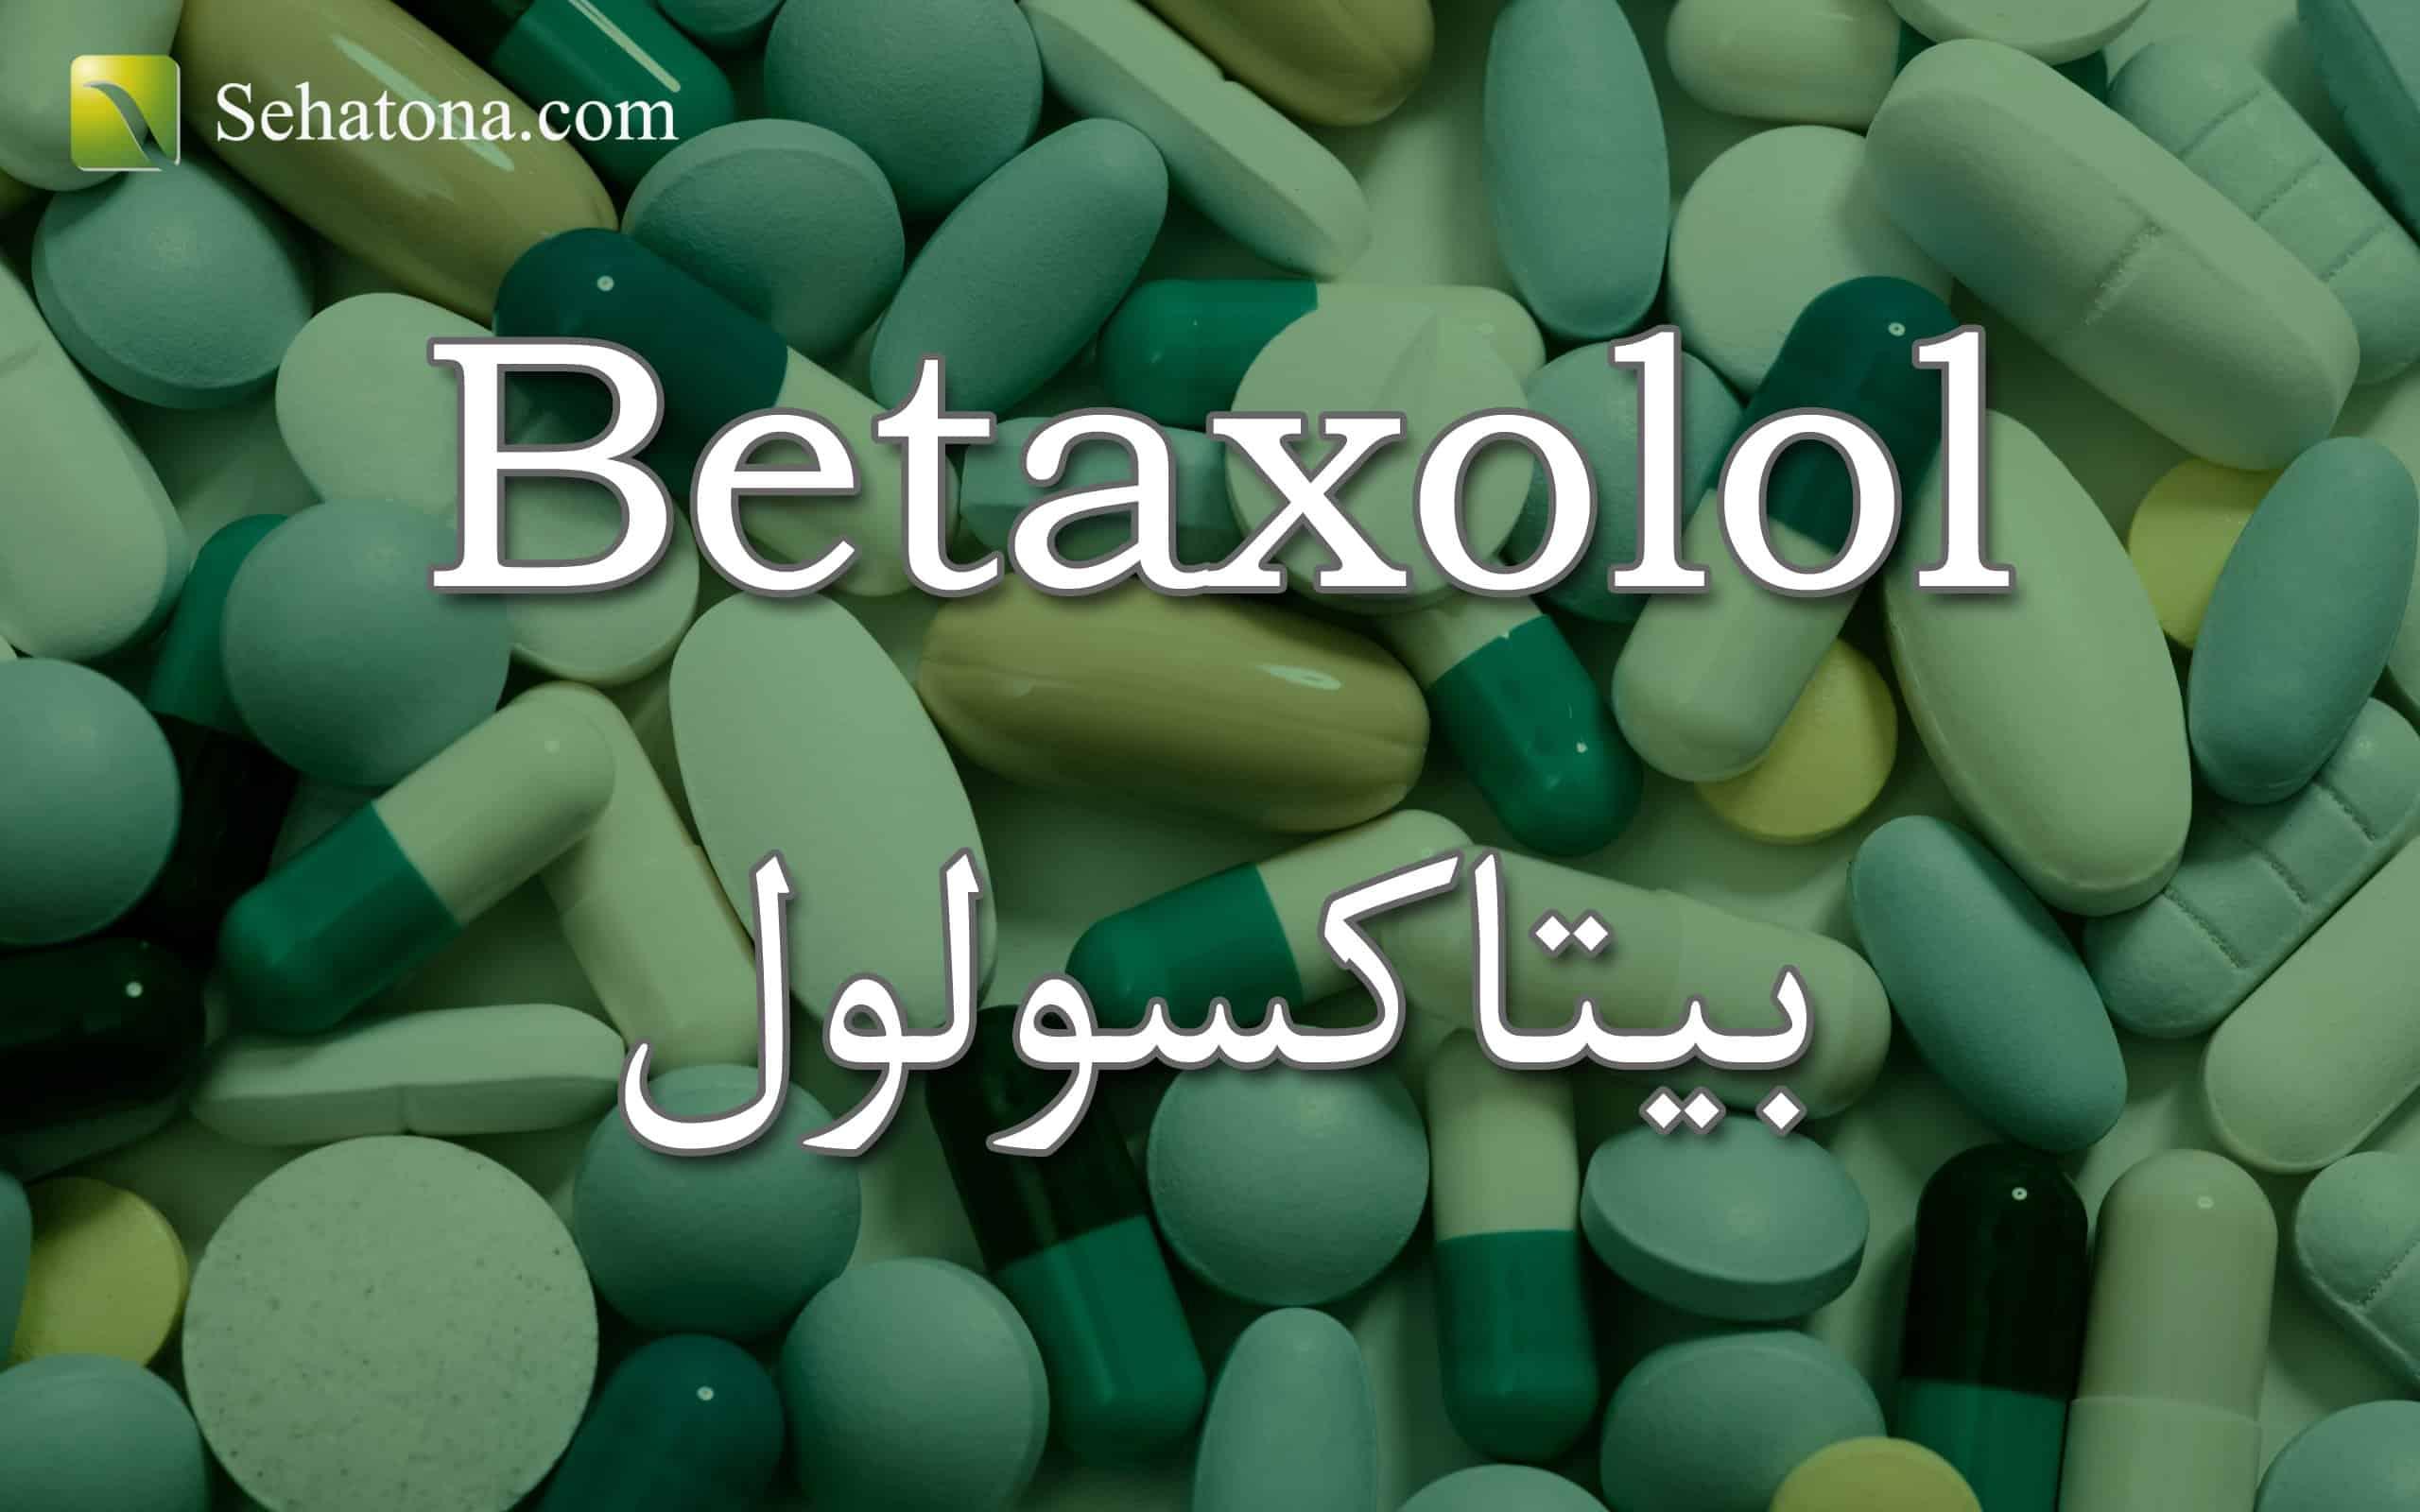 Betaxolol